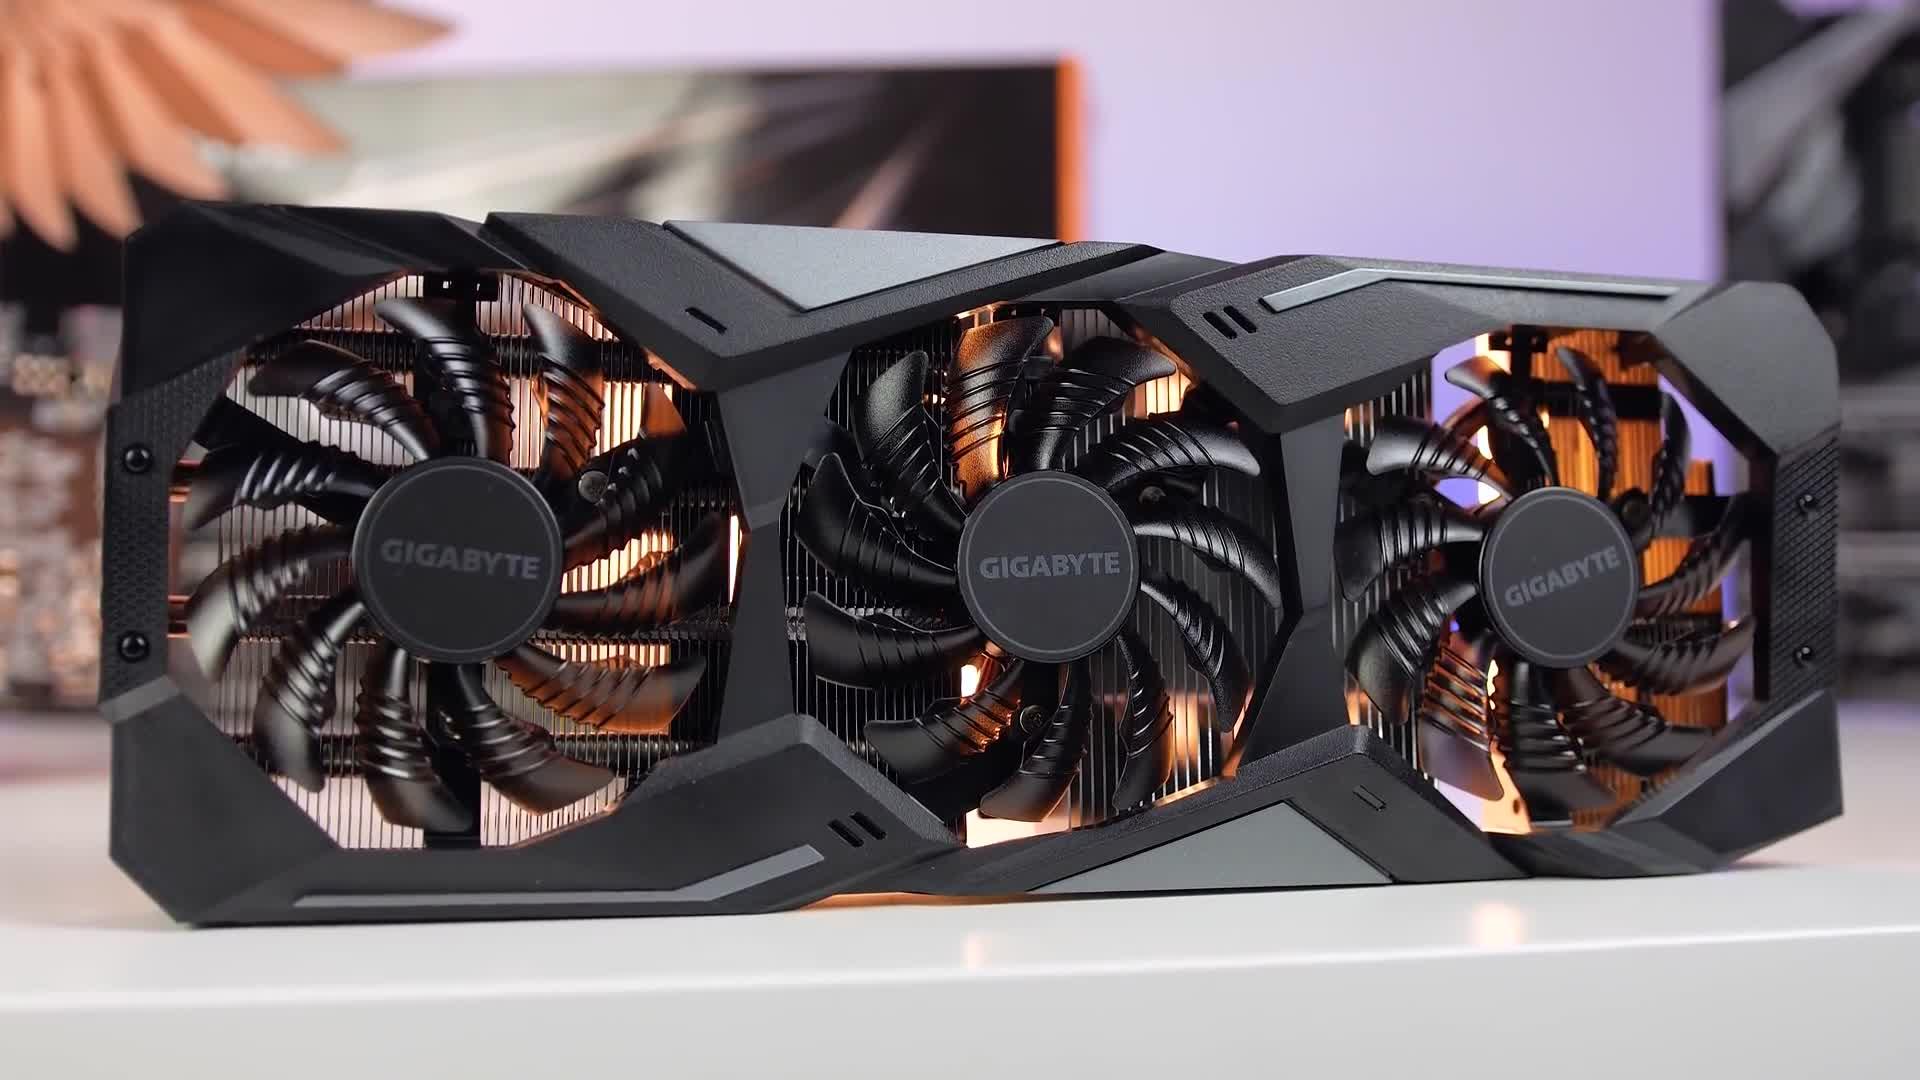 Test, Grafikkarte, Geforce, Zenchilli, Zenchillis Hardware Reviews, Gigabyte, RTX, RTX 2060, GeForce RTX 2060, Gigabyte GeForce RTX 2060 Gaming OC Pro, Gigabyte GeForce RTX 2060 Gaming OC, GeForce RTX 2060 Gaming OC Pro, GeForce RTX 2060 Gaming OC, Gigabyte GeForce RTX 2060